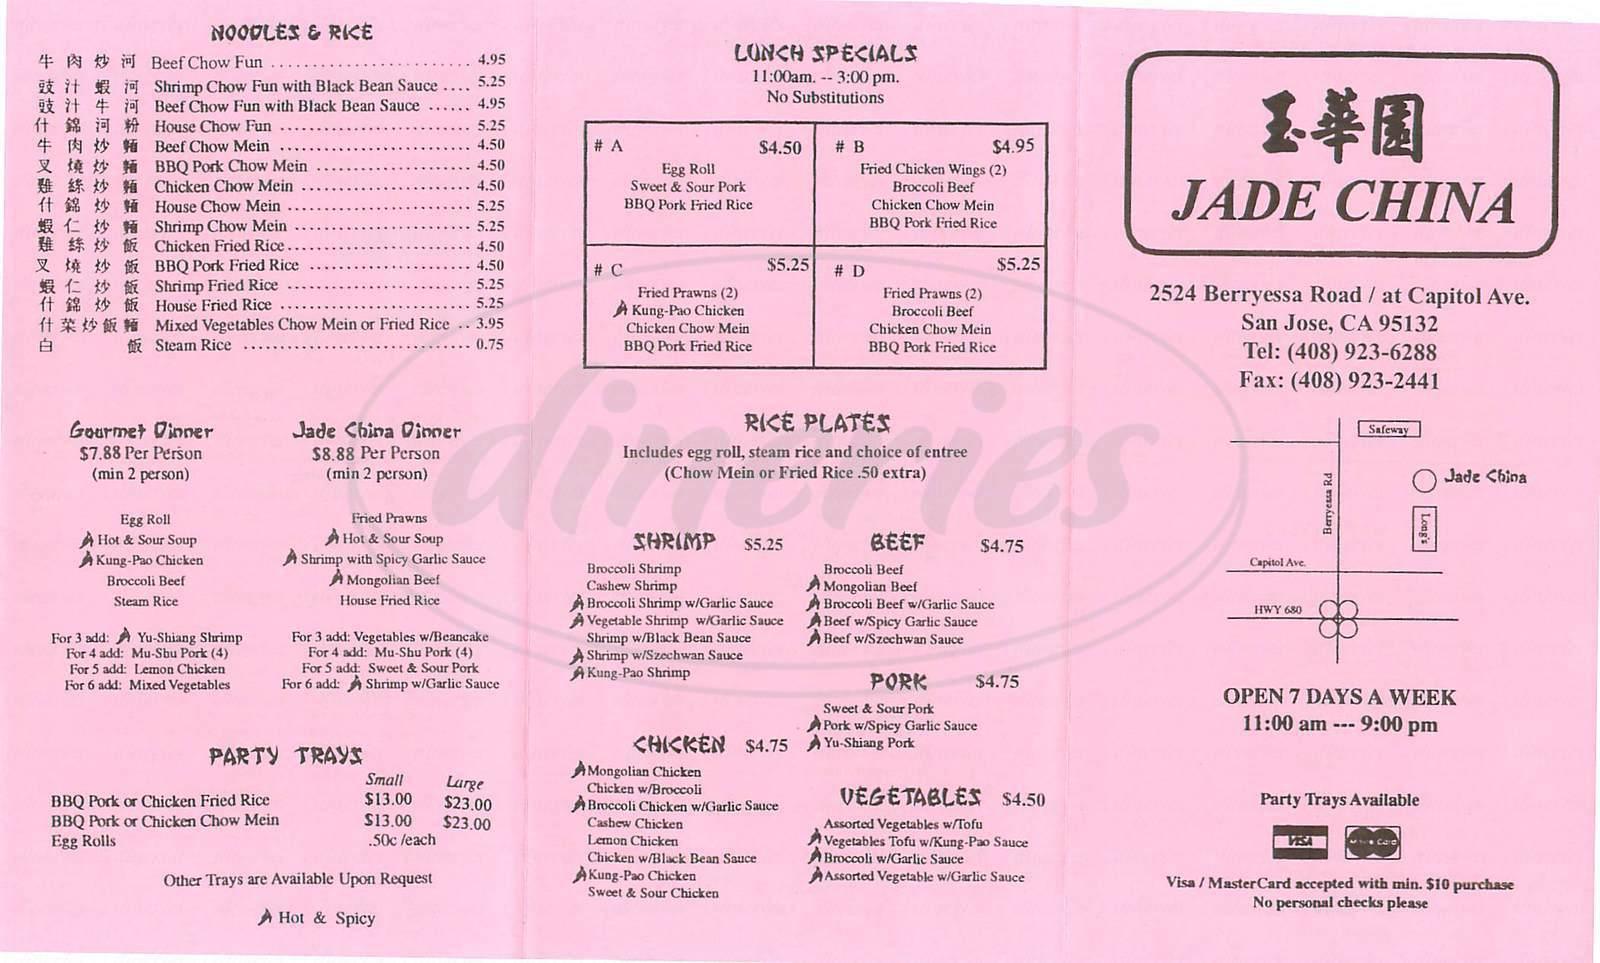 Jade China Restaurant In San Jose Ca